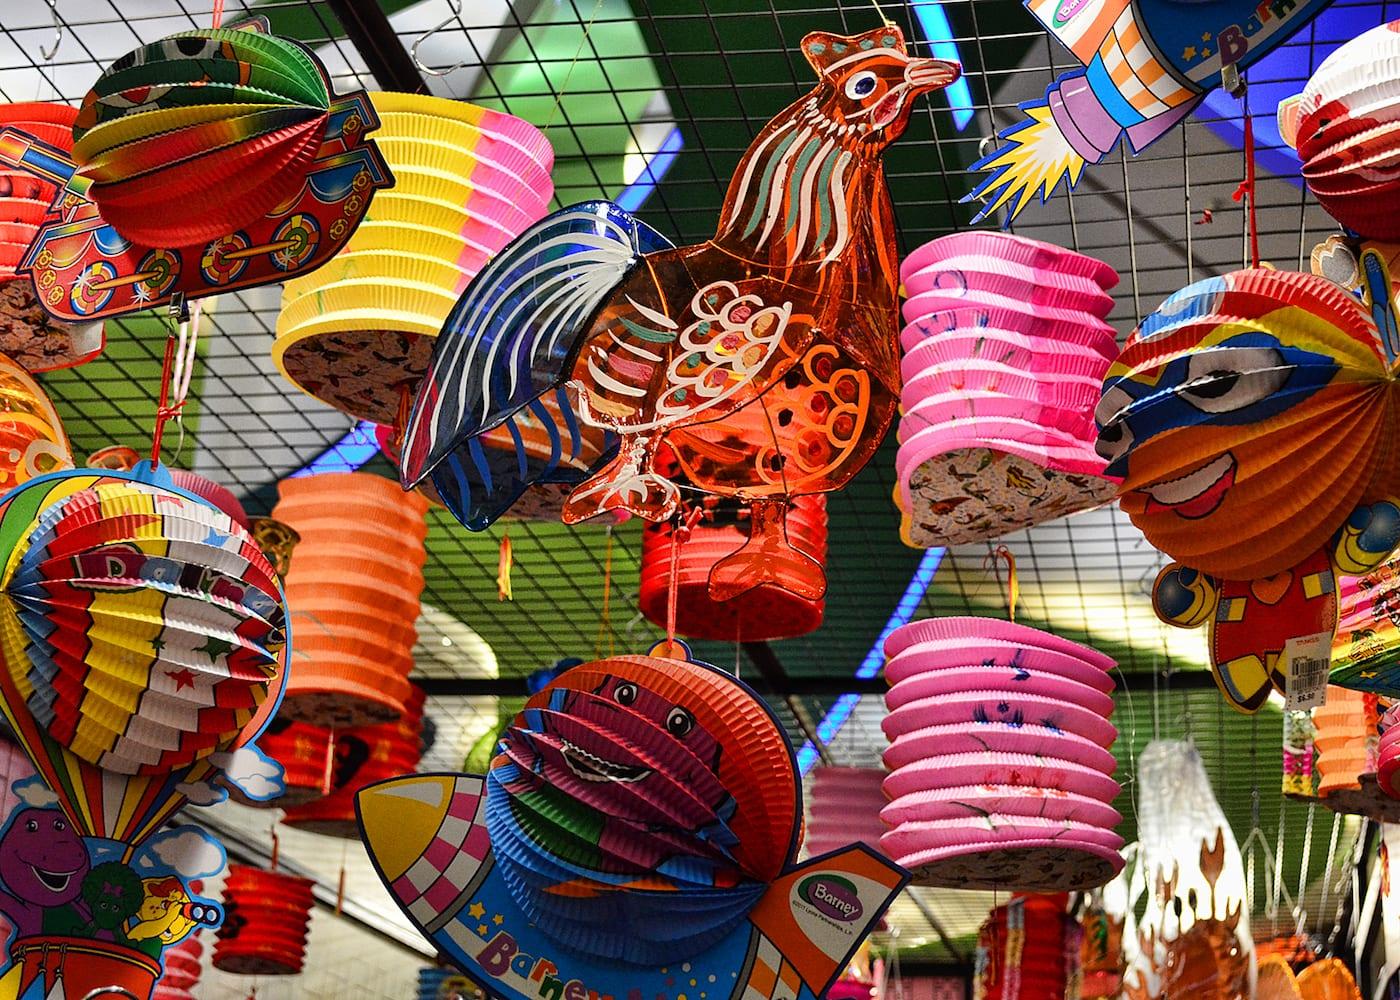 Mid-Autumn Festival in Singapore: Lanterns and mooncakes galore